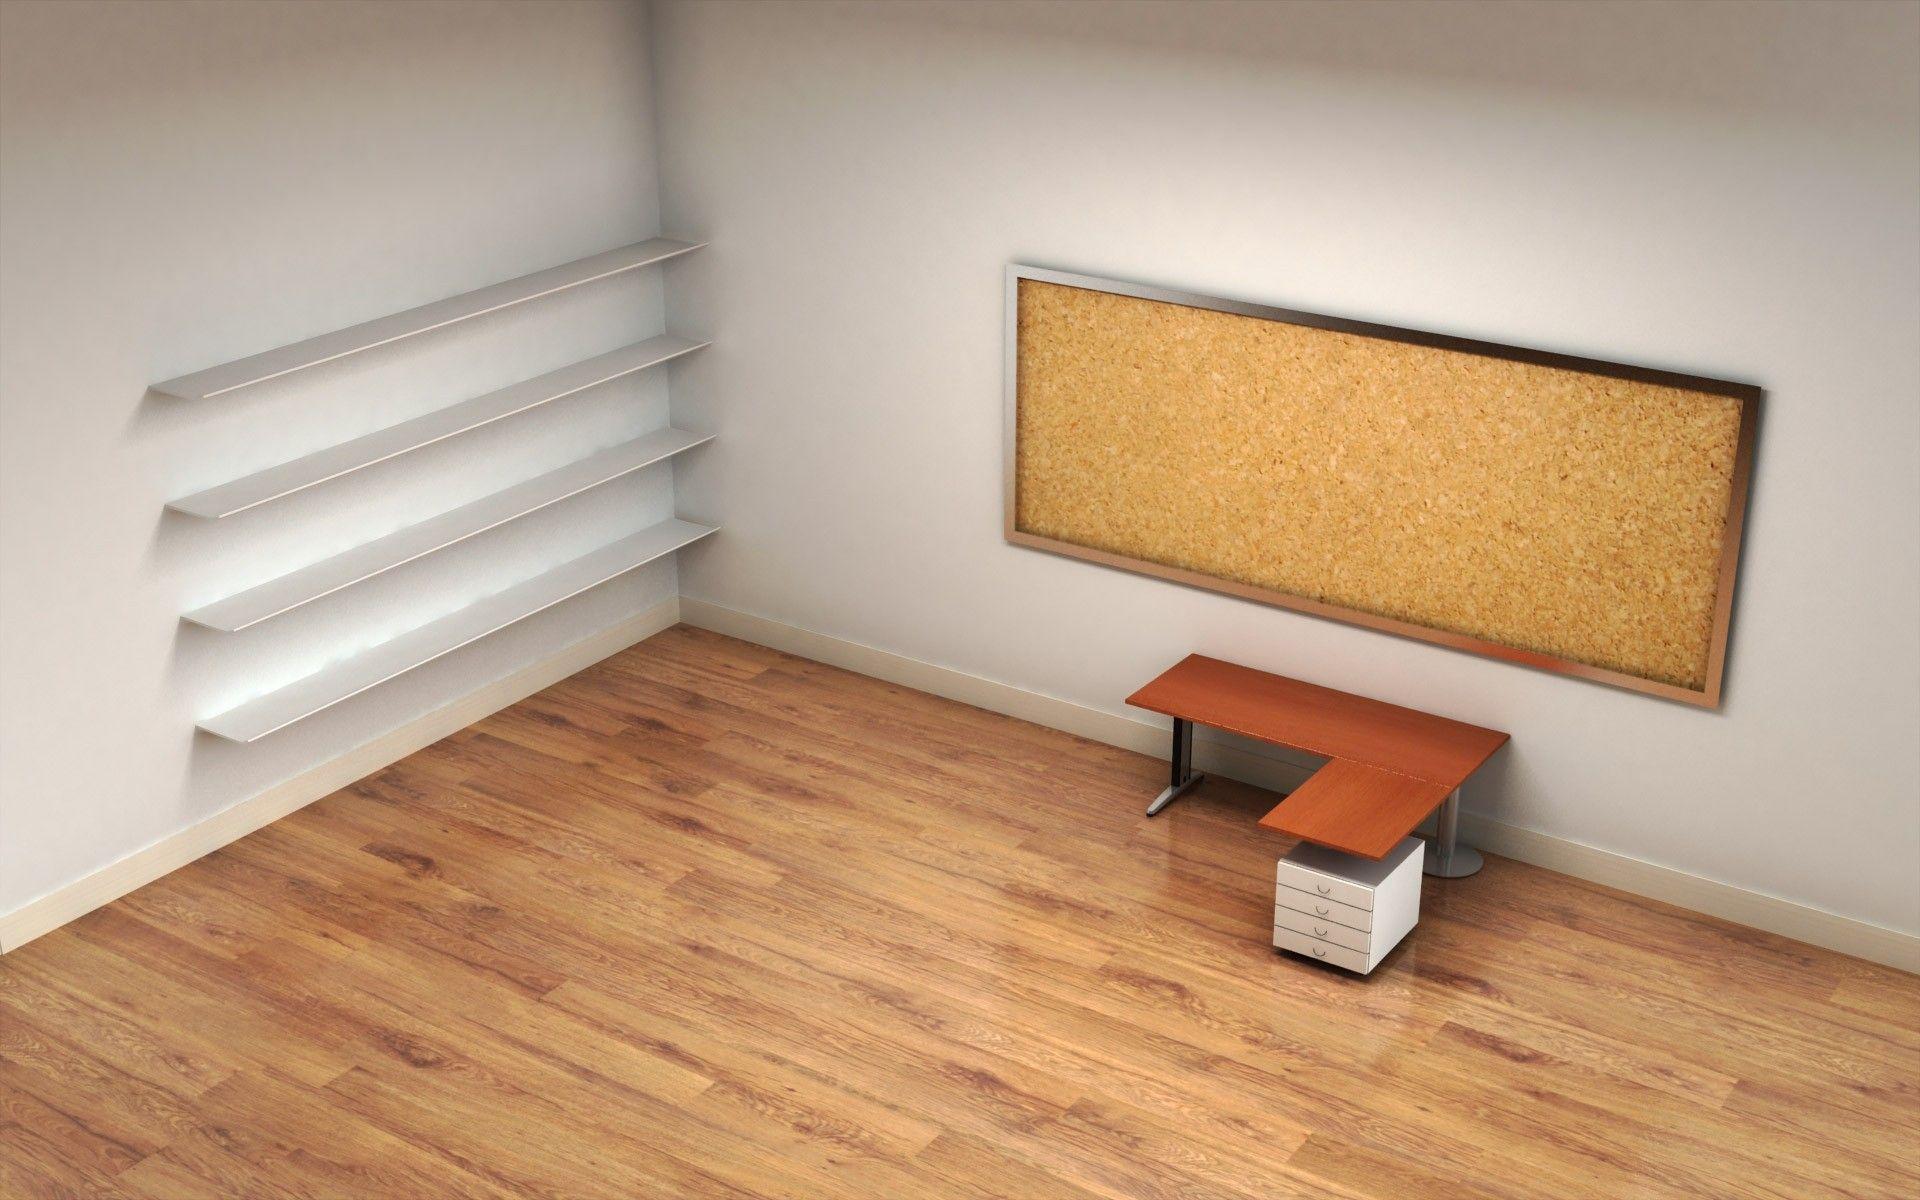 Full Hd Classic 3d Desktop Wallpaper Hd In 2021 3d Desktop Wallpaper Desktop Wallpaper Desktop Wallpaper Design